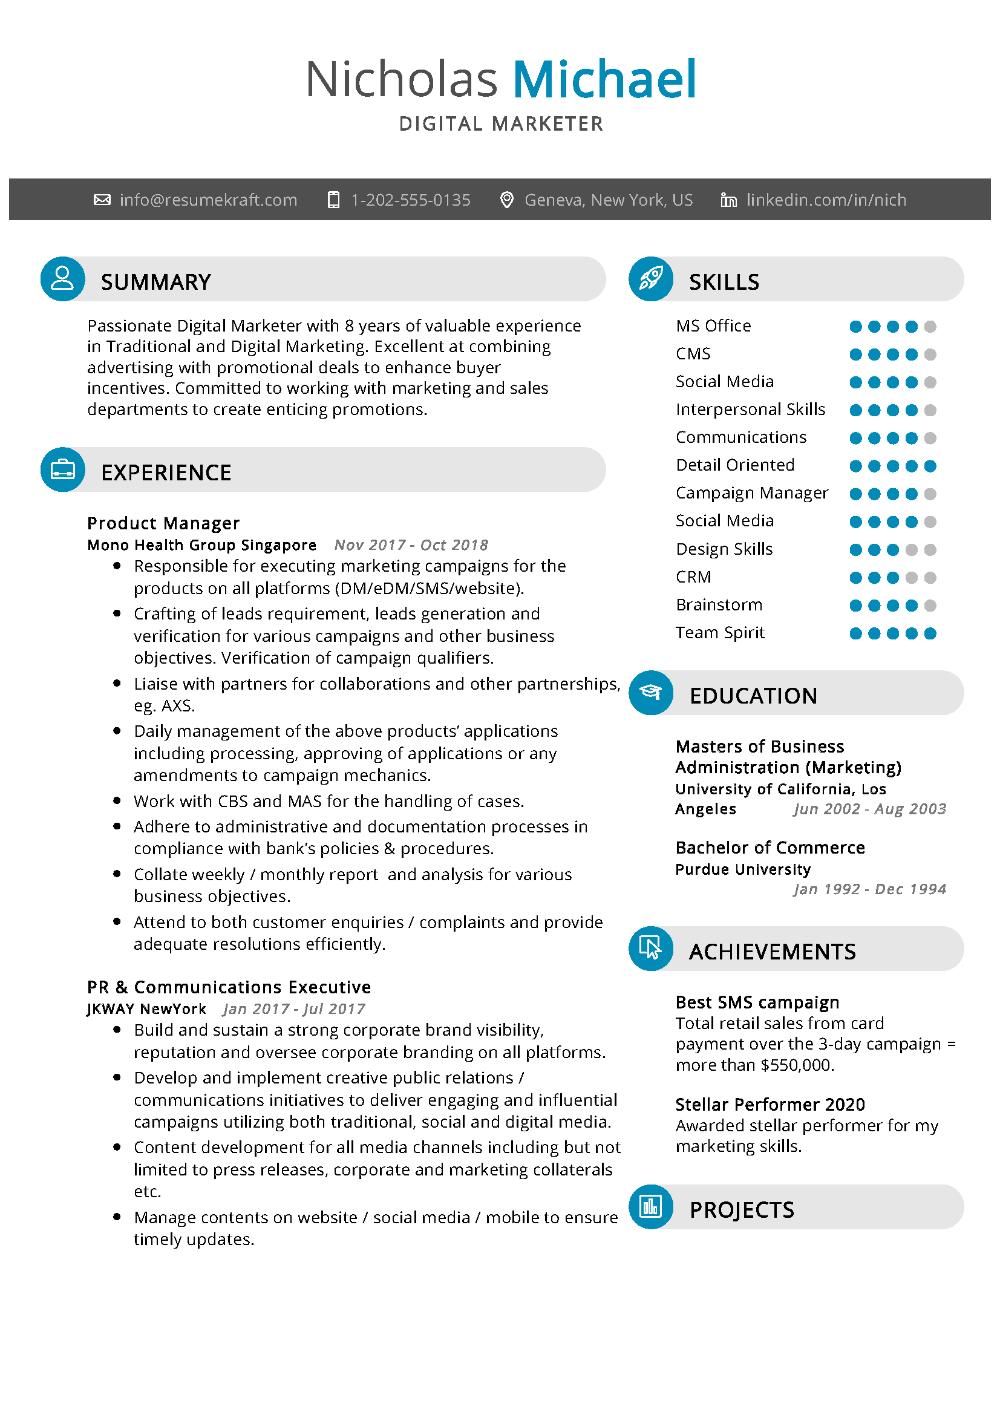 100 Professional Resume Samples For 2020 Resumekraft Marketing Resume Digital Marketing Resume